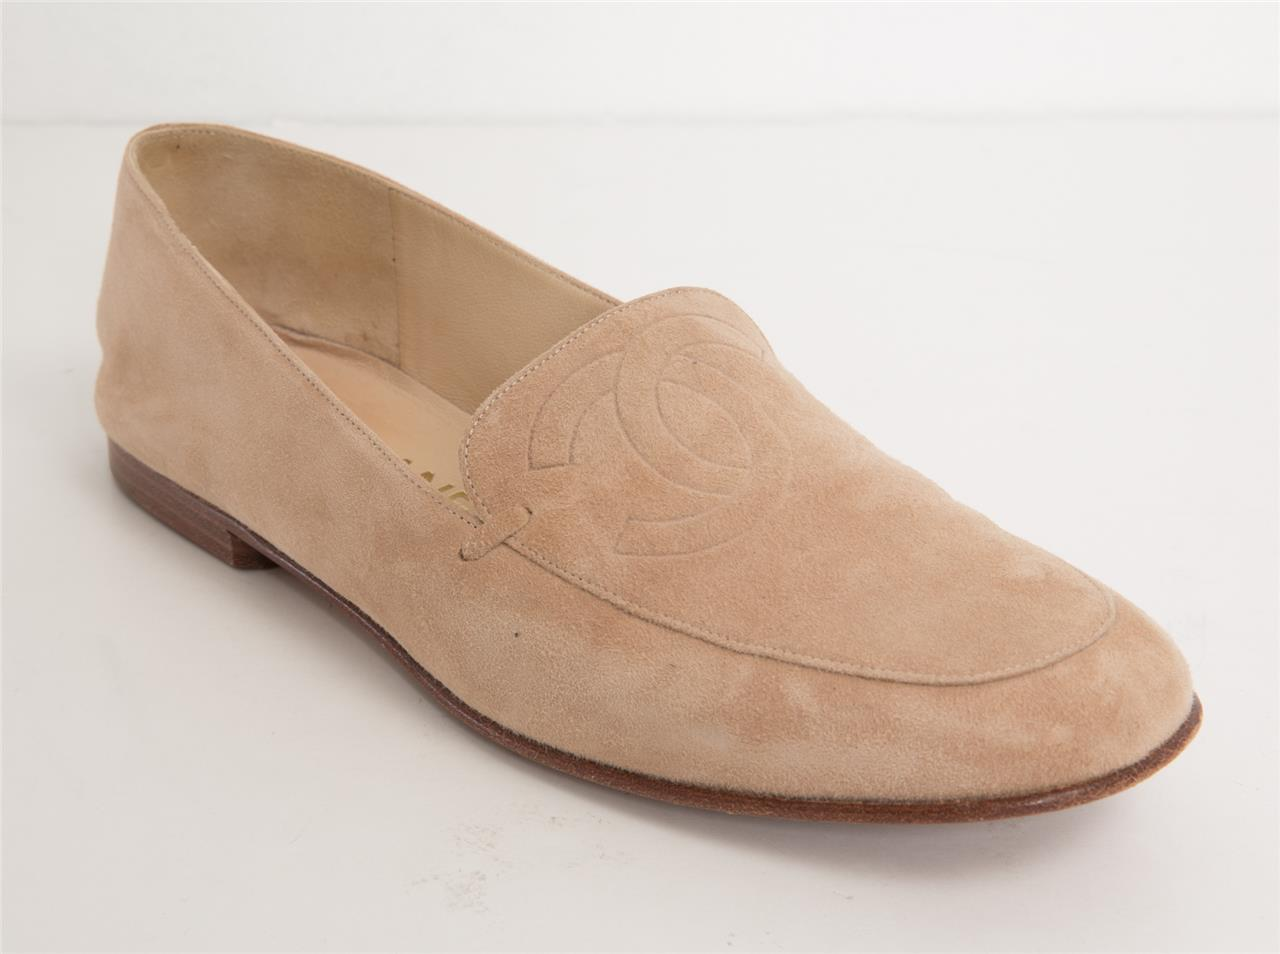 mejores zapatillas de deporte d447d f556d Detalles de Chanel Mujer ante Canela cc Logo Mocasines Beis Color Carne  Zapatos Planos 7-37